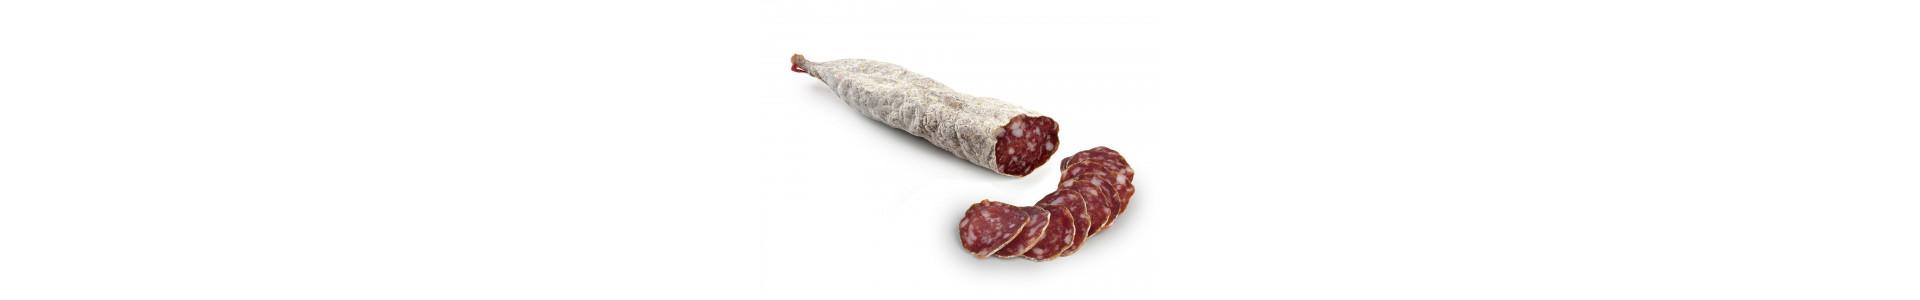 Saucisson, Rosette, Jambon, Bacon